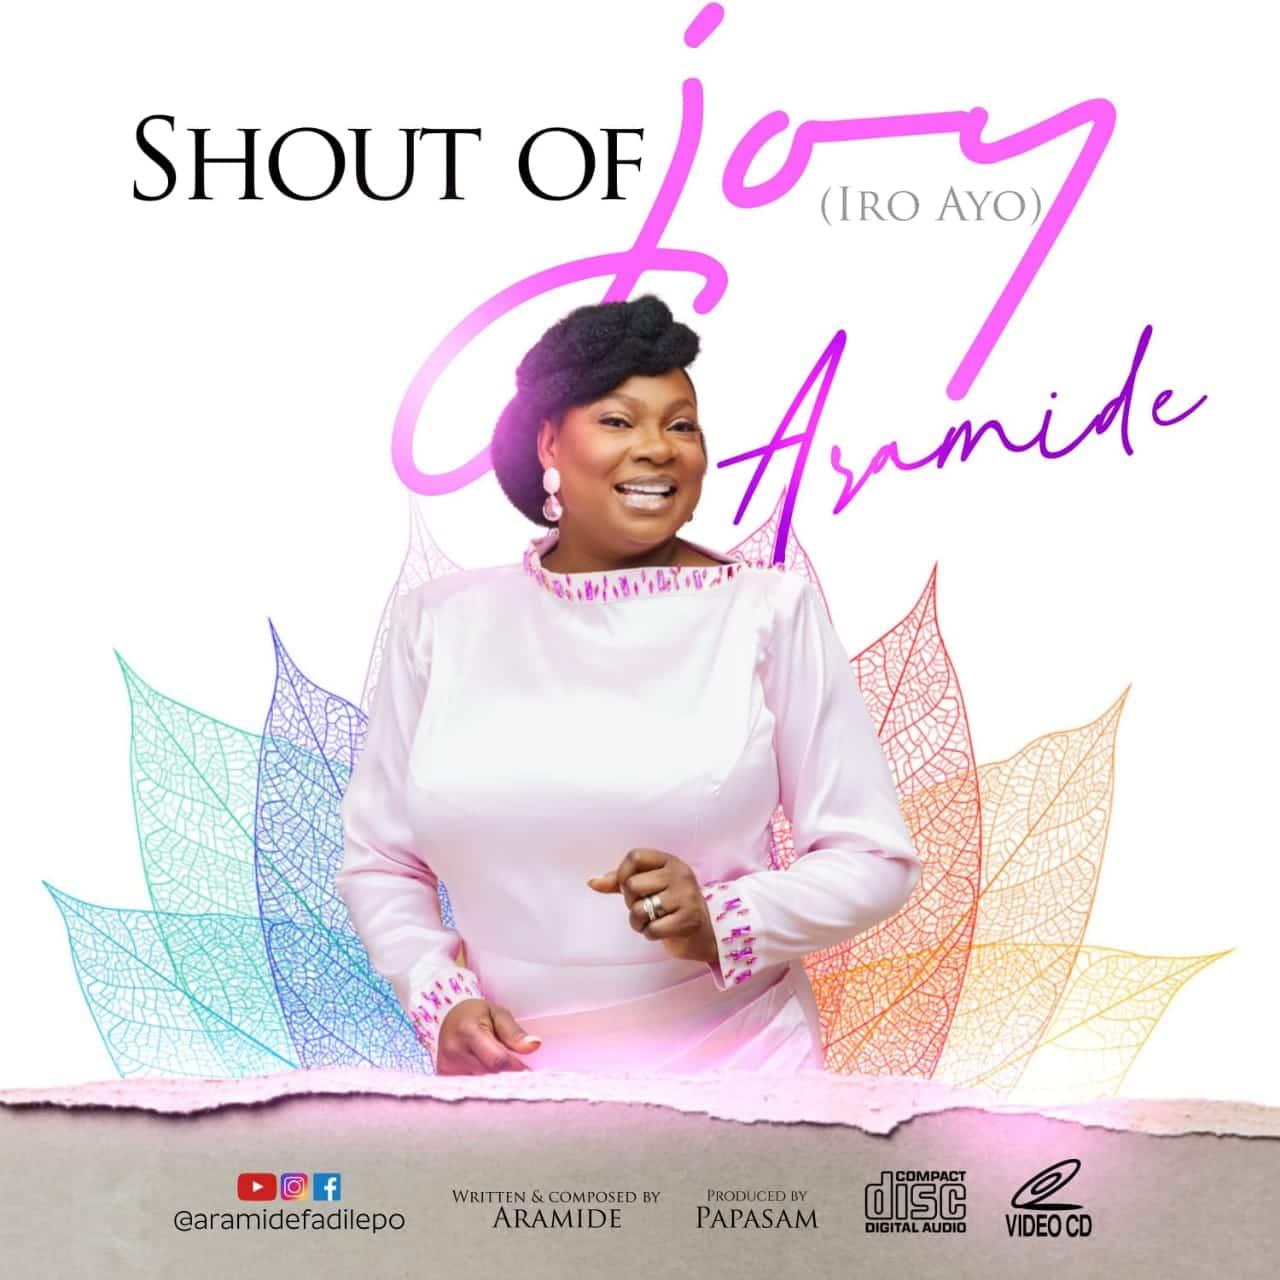 Aramide - Shout Of Joy